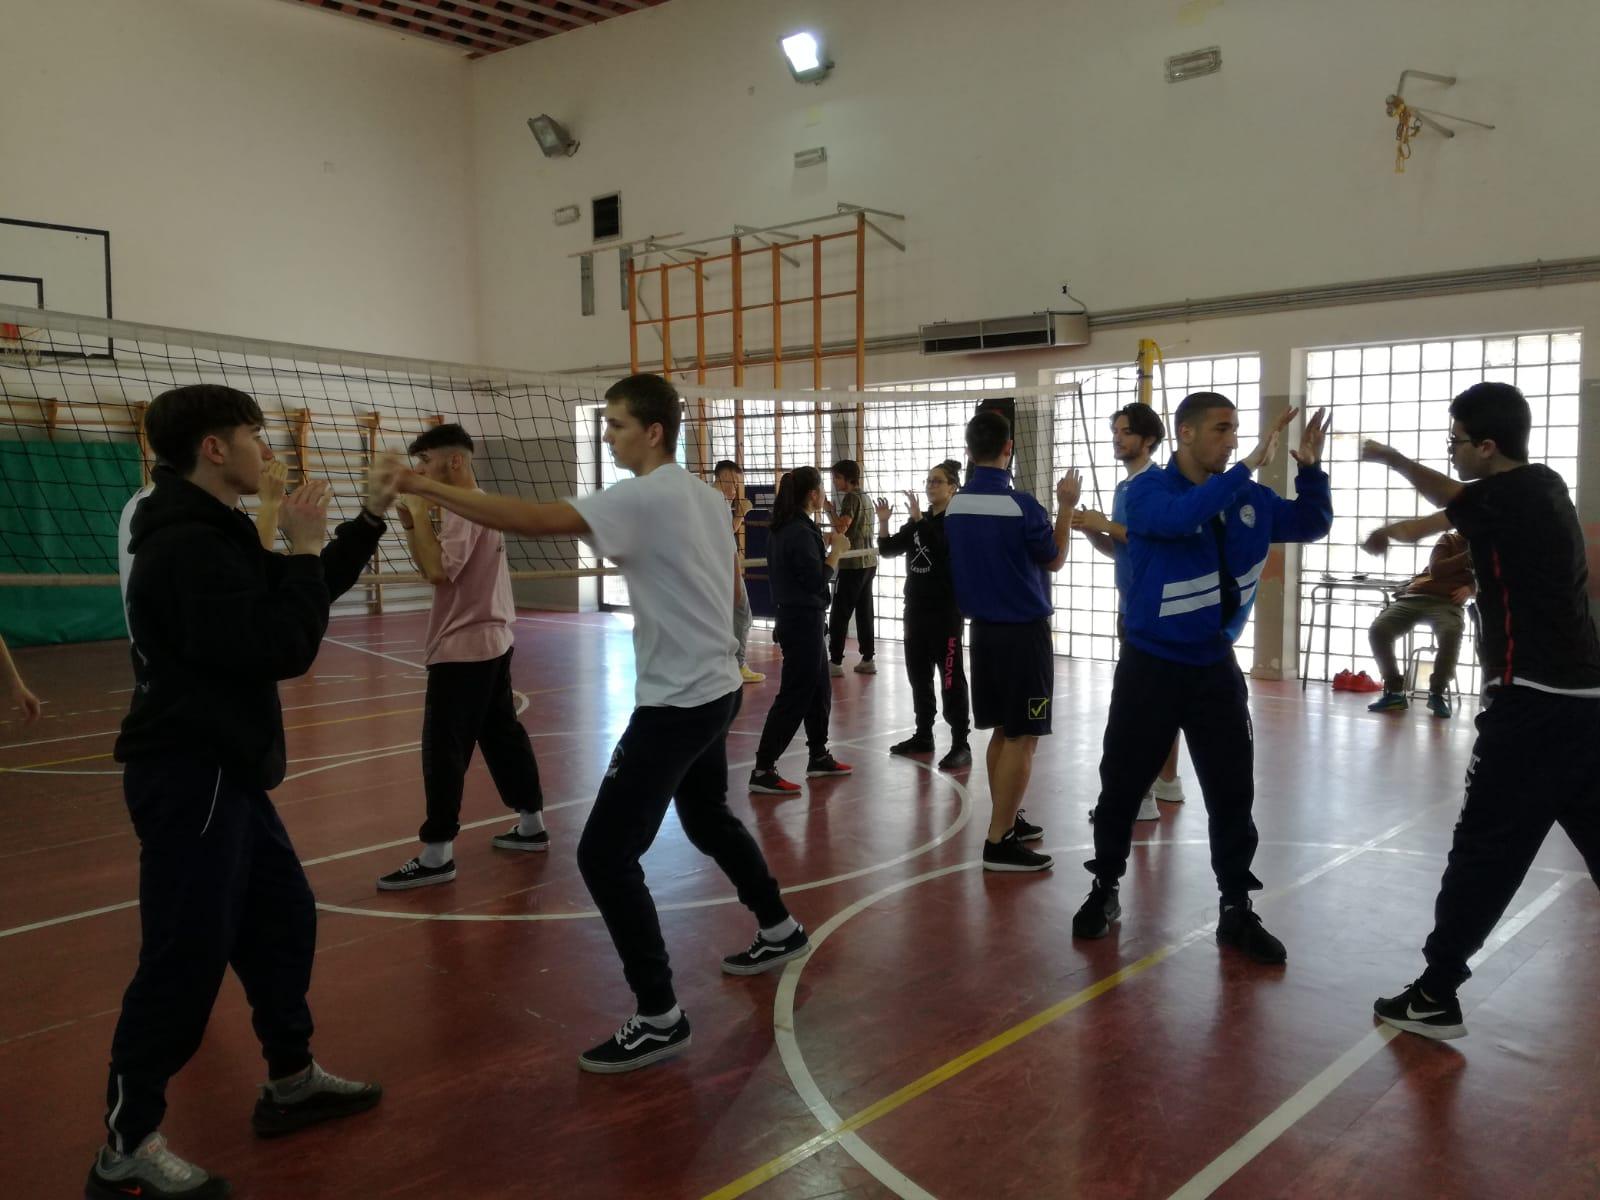 Campobasso: Wushu, all'I.I.S.S. Alfano approva la nuova disciplina sportiva.